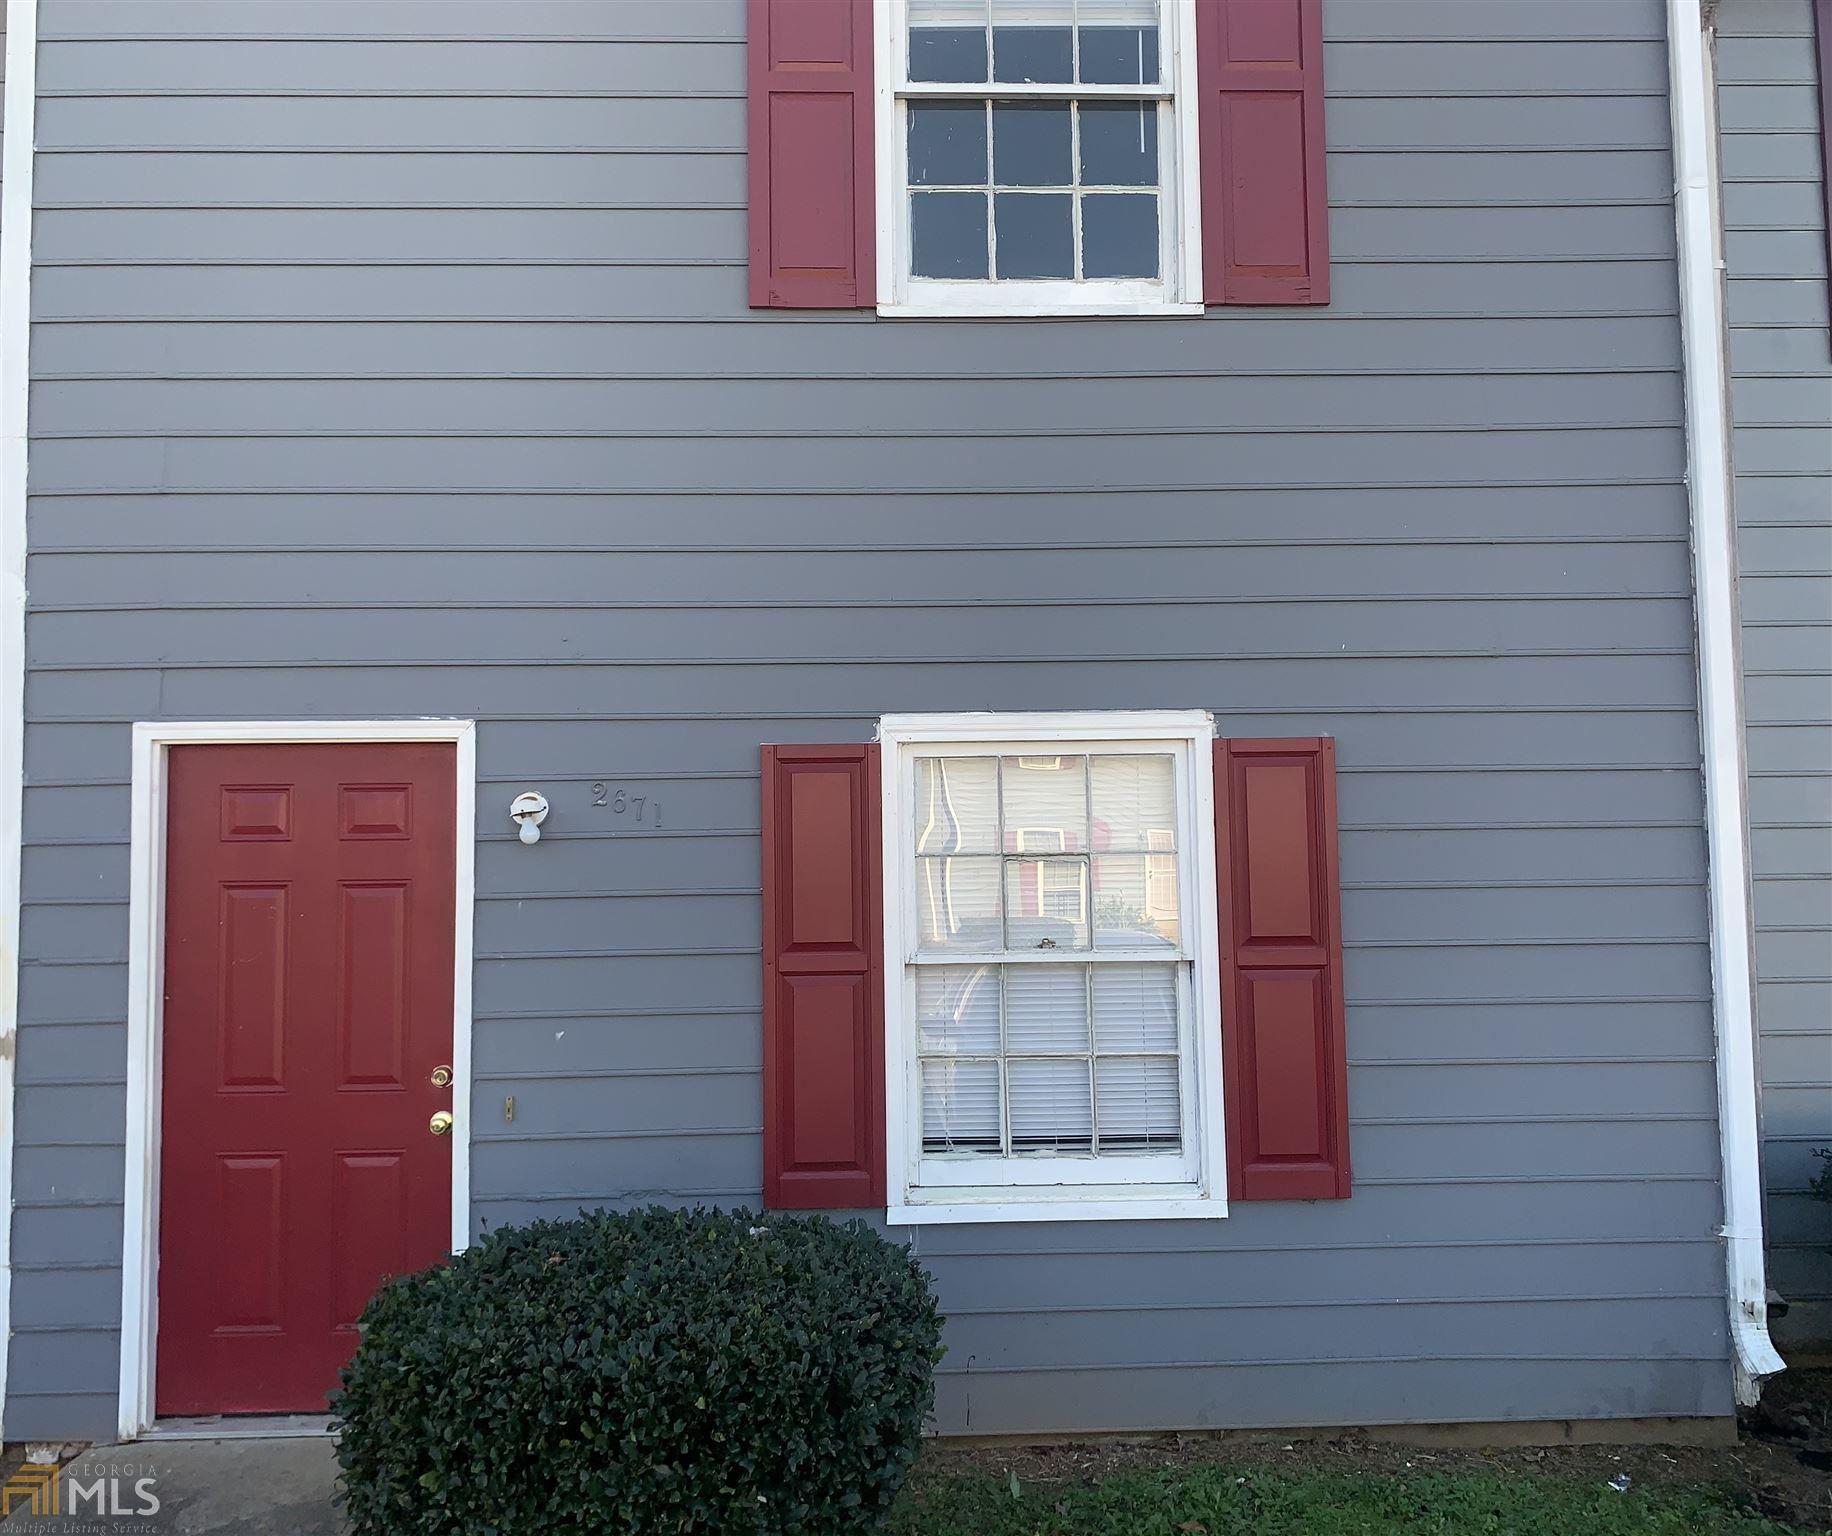 2671 Evans Mill Dr, Lithonia, GA 30058 - #: 8892514